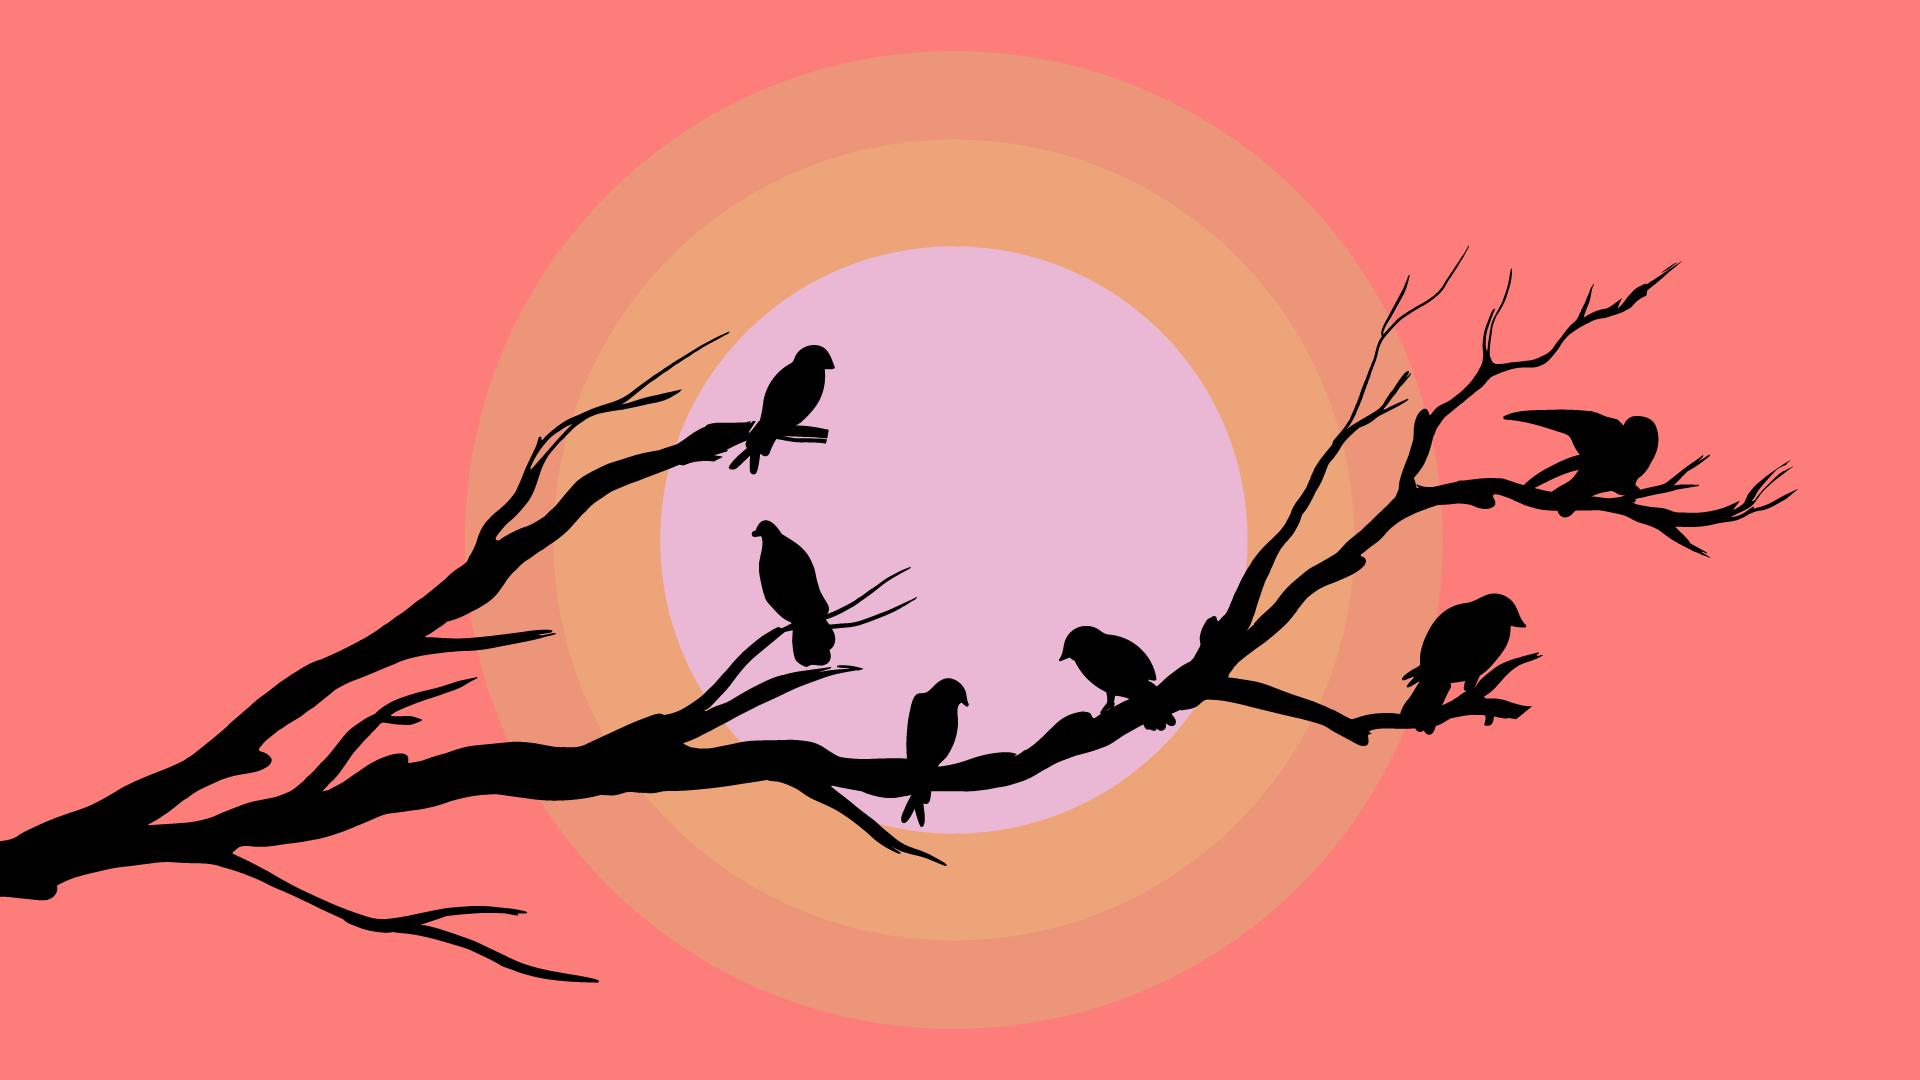 CUTE, BIRDS, MINIMALISTIC, 8K